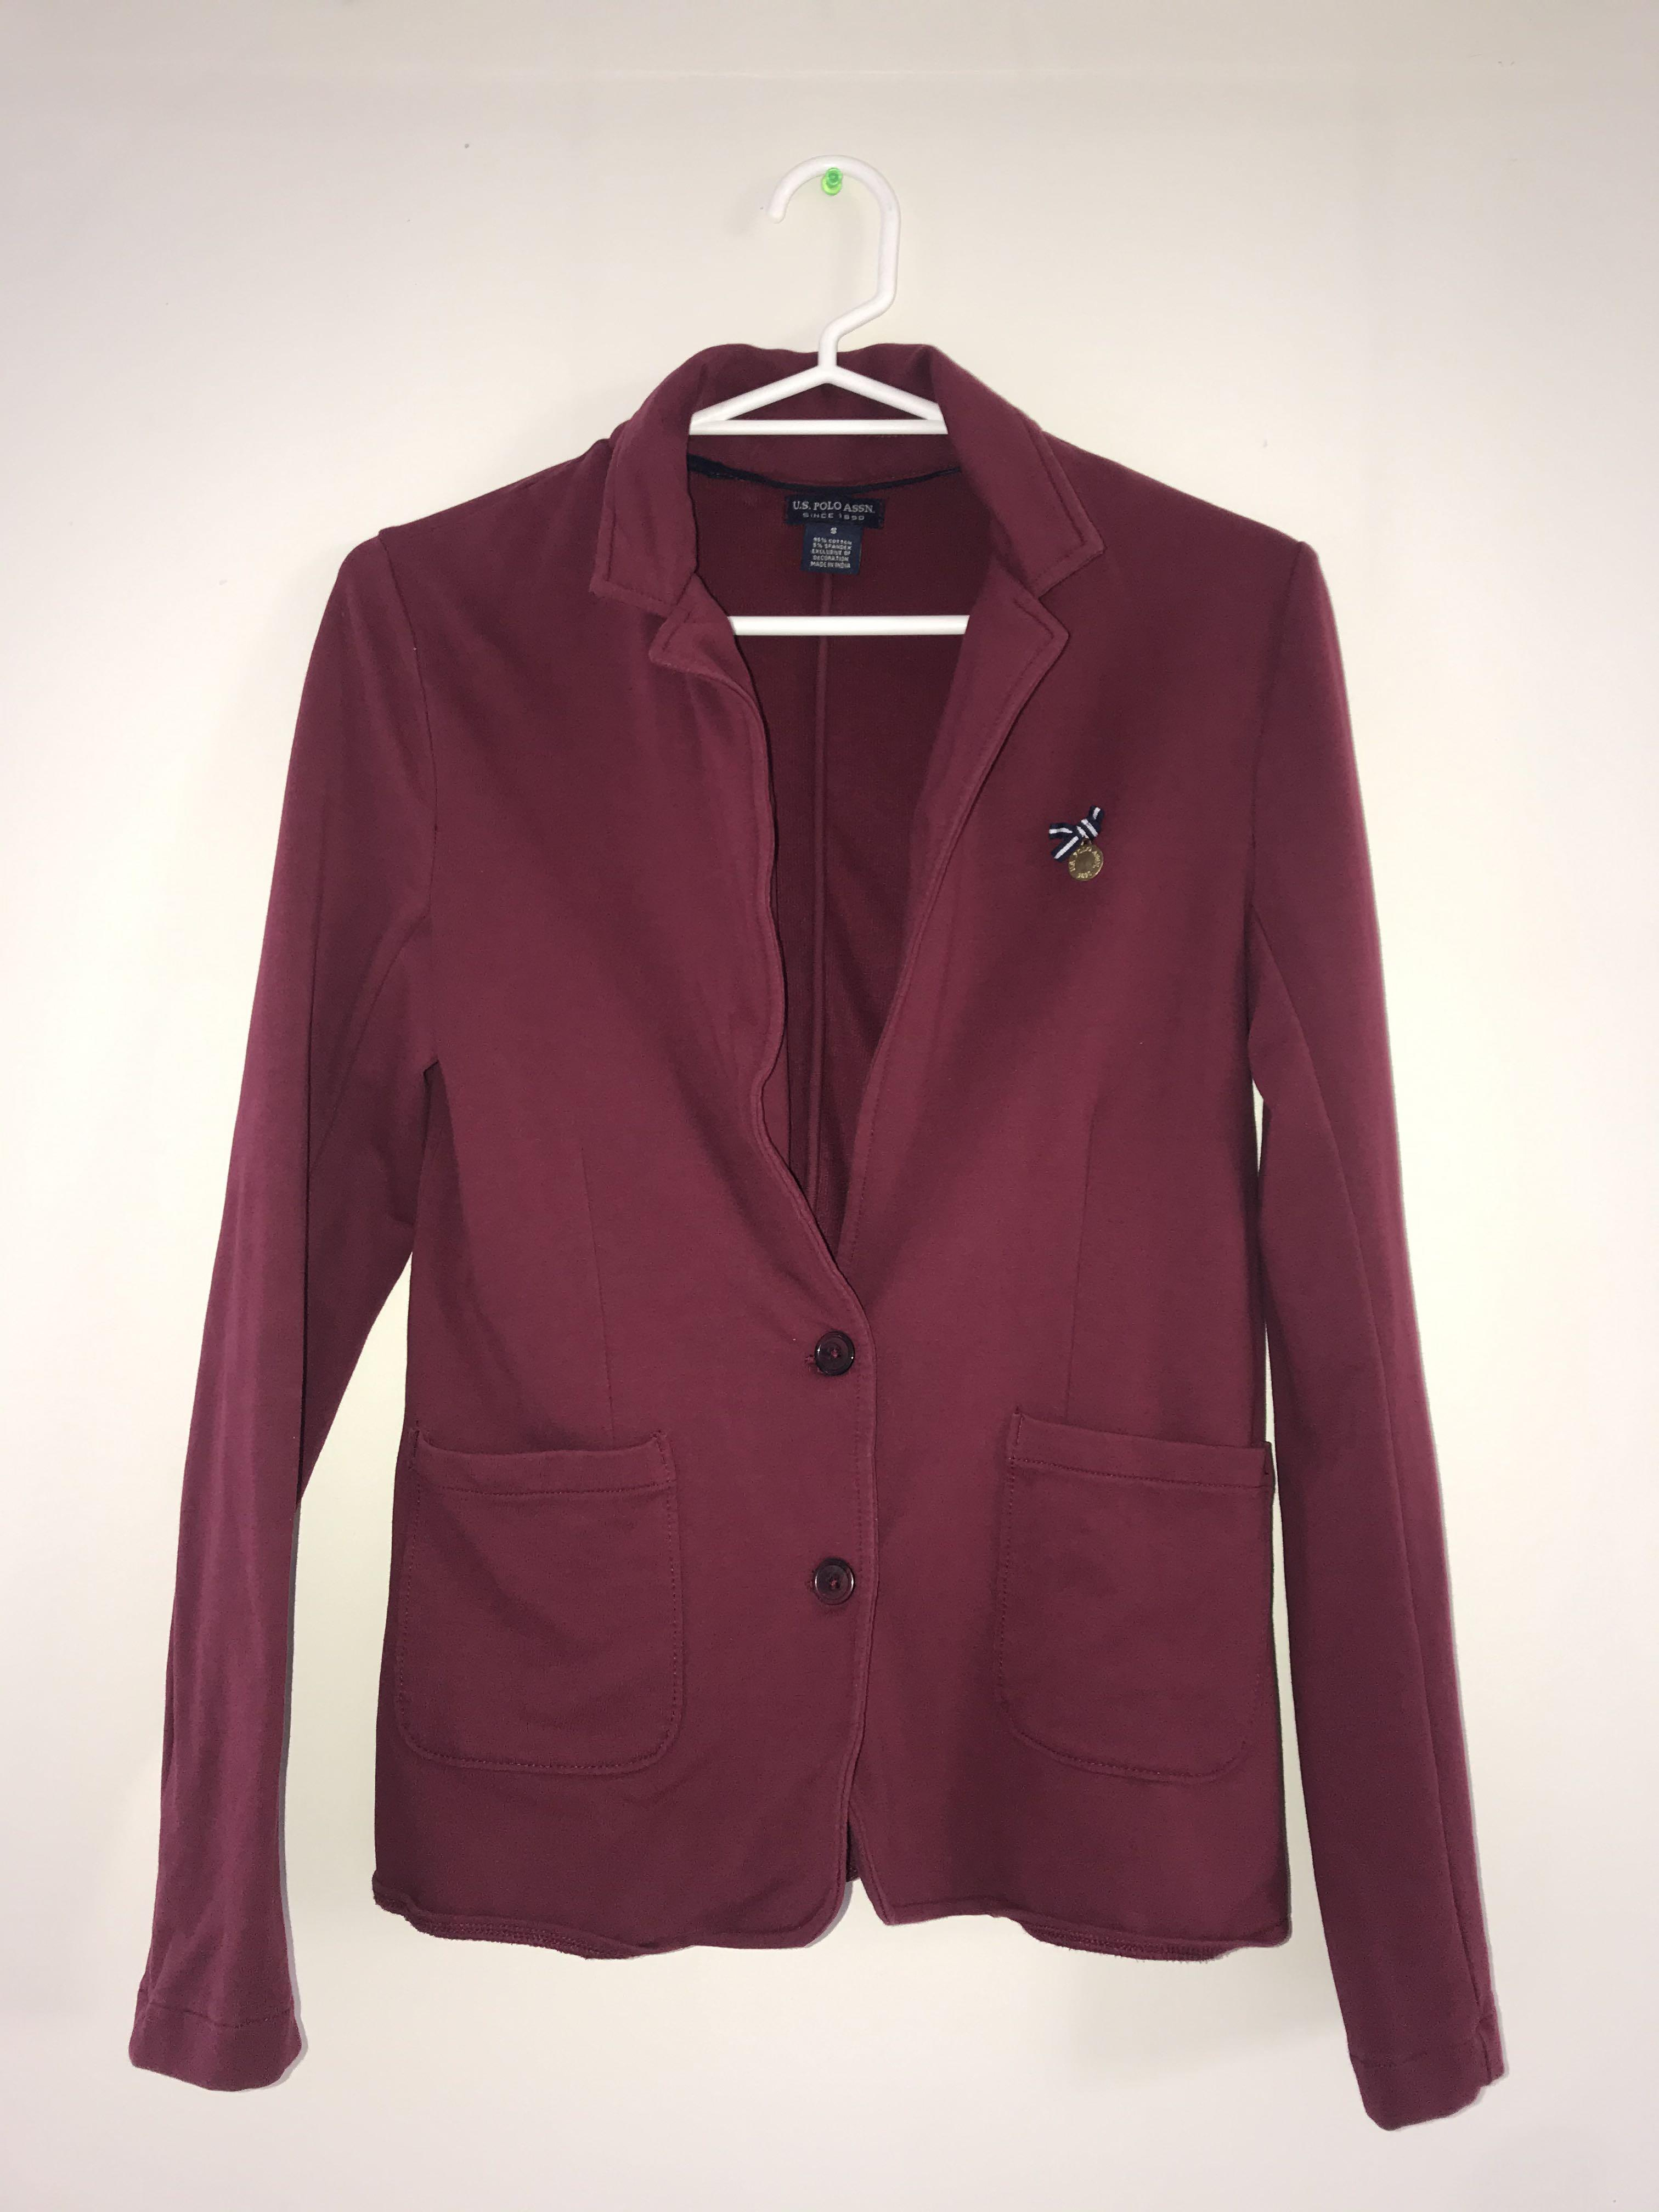 [U.S. POLO ASSN.] Maroon blazer